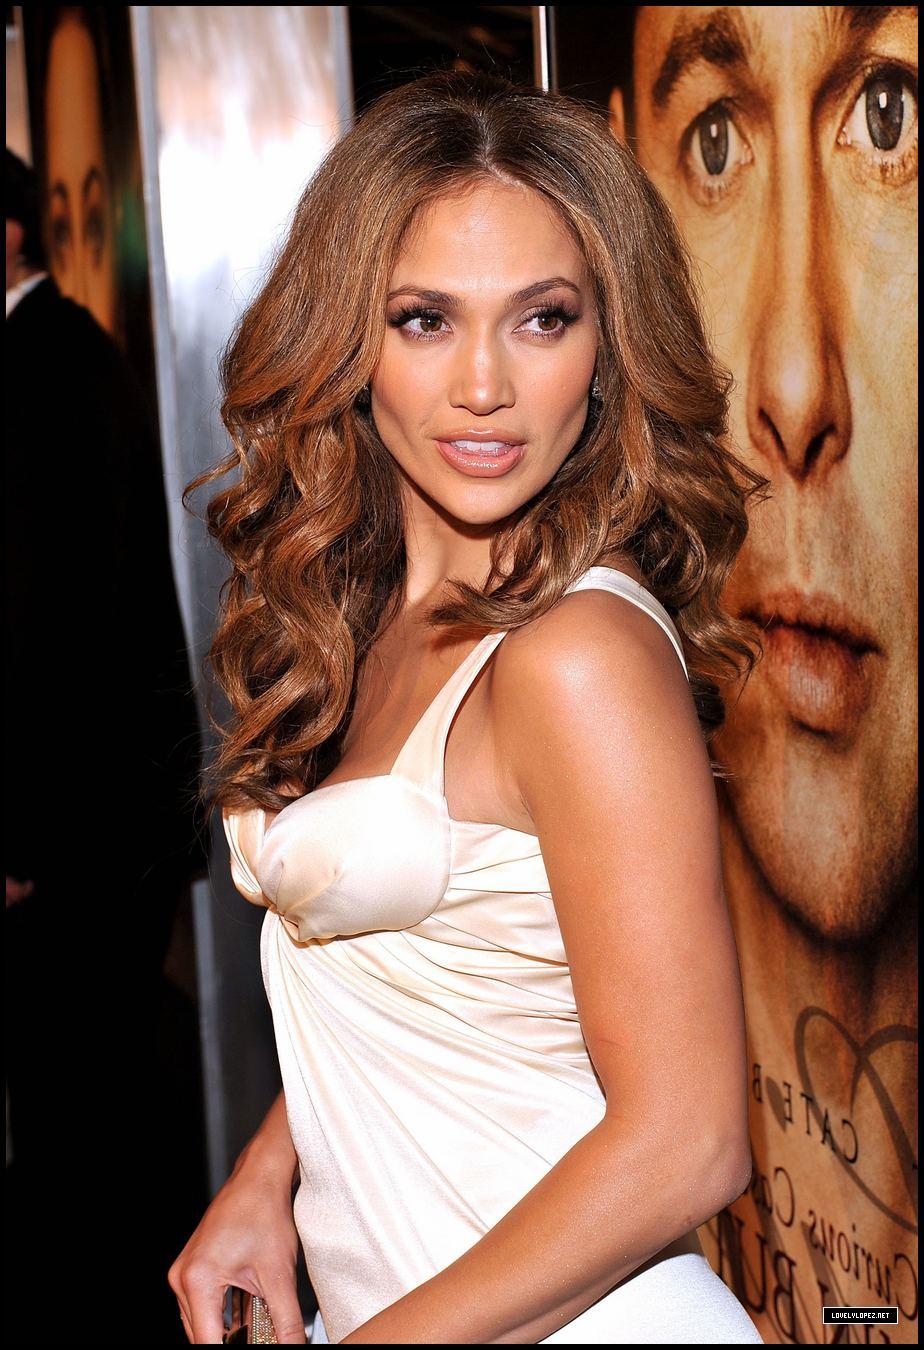 Photo Page: Jennifer Lopez Photo Gallery - Page #290